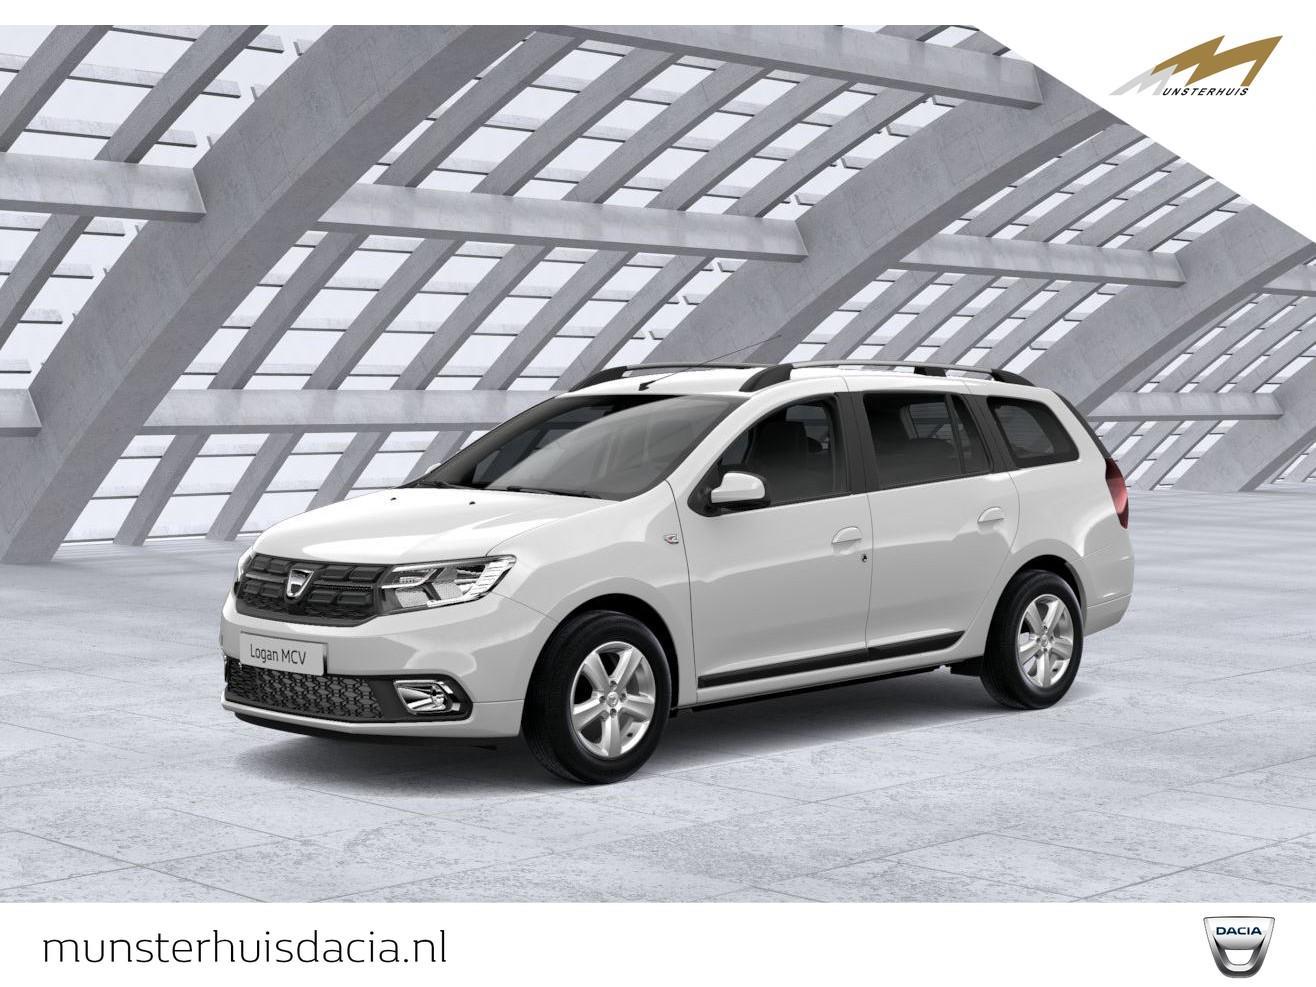 Dacia Logan Mcv tce 90 laureate  - nieuw